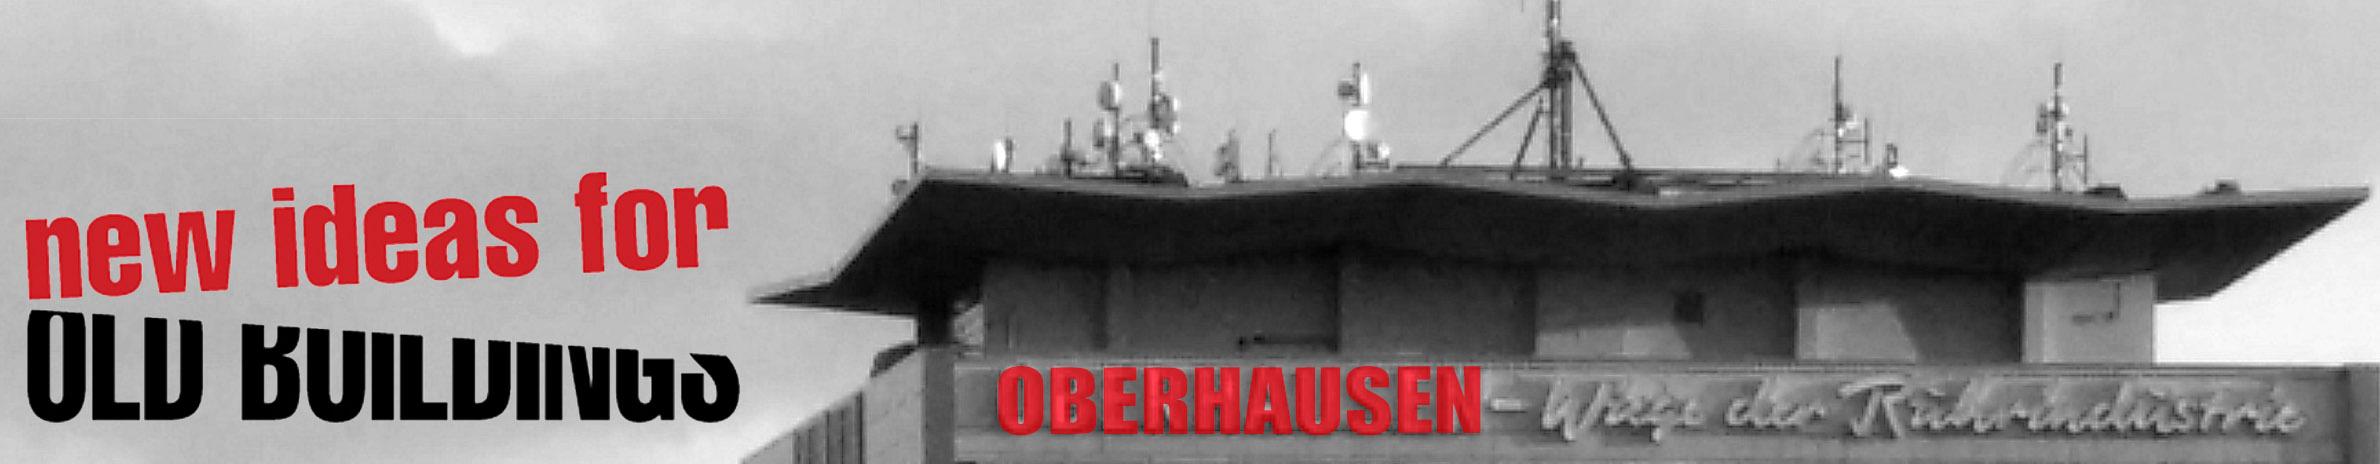 NIFOB-Oberhausen-5